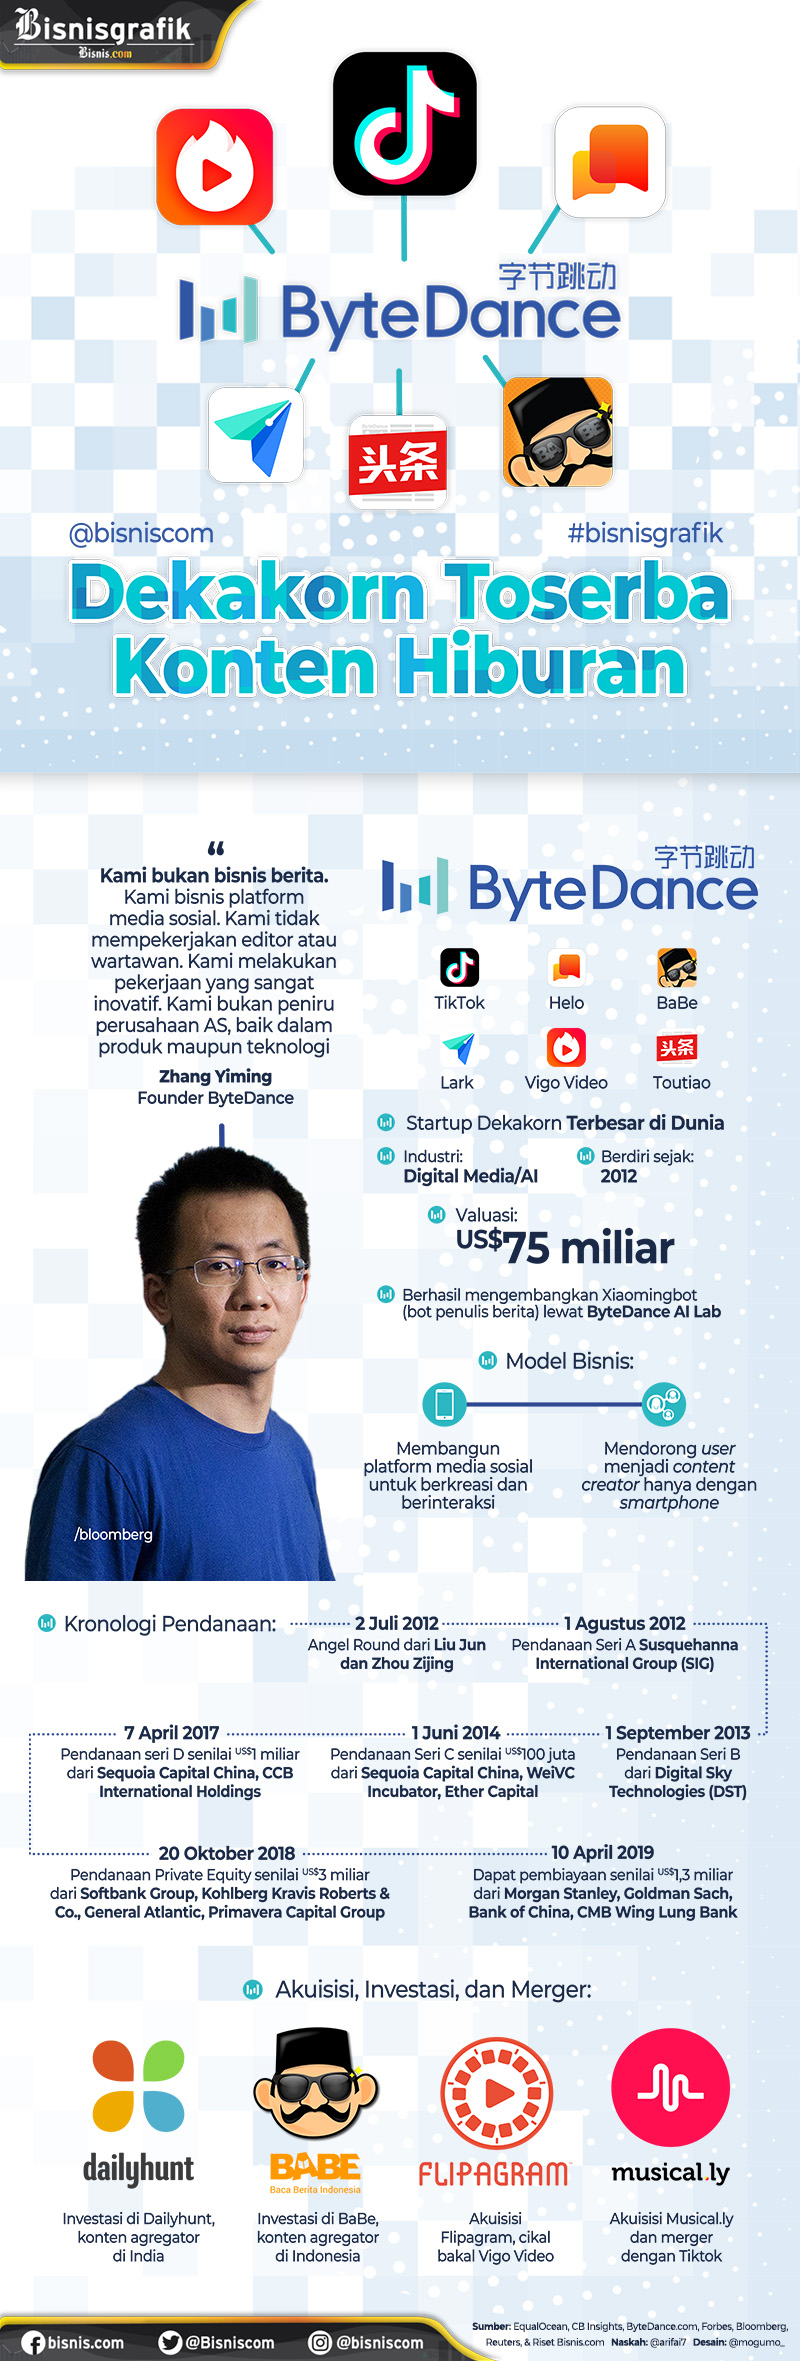 ByteDance, Toserba Konten Hiburan.  -  Ilham Mogu